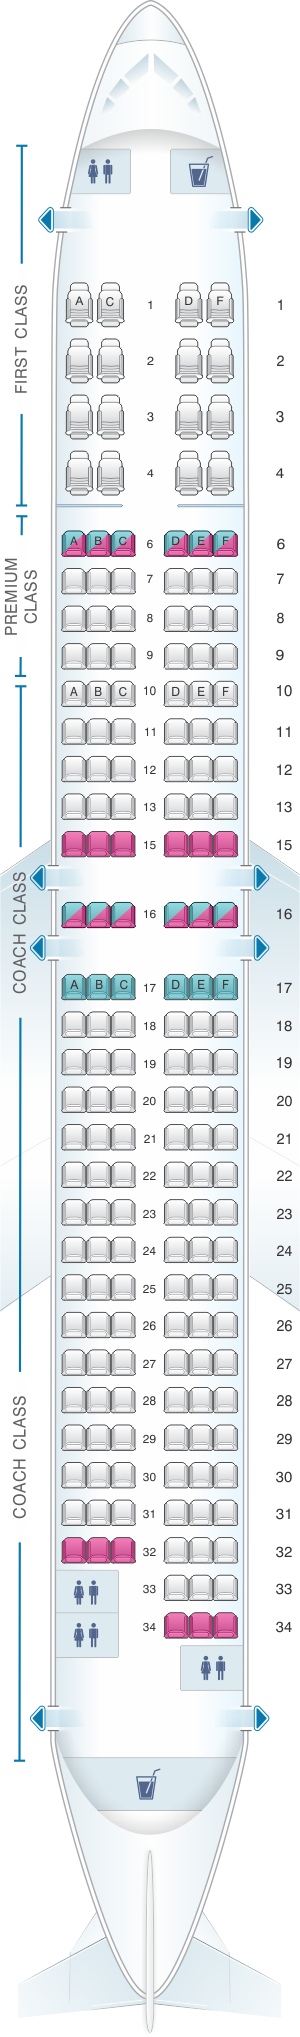 Seat map for Alaska Airlines - Horizon Air Boeing B737 900ER